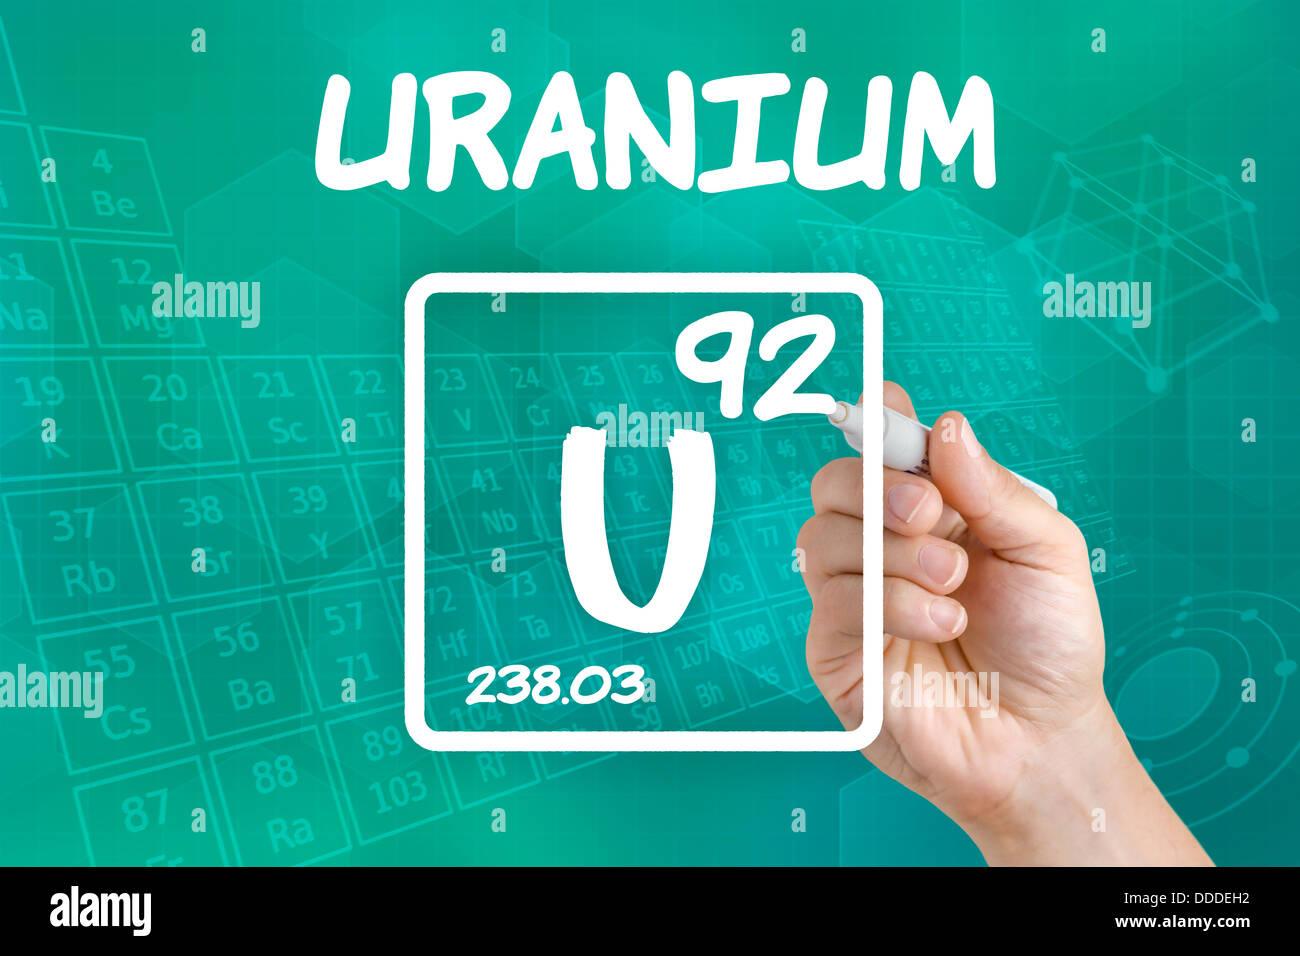 Symbol for the chemical element uranium stock photo royalty free symbol for the chemical element uranium gamestrikefo Choice Image